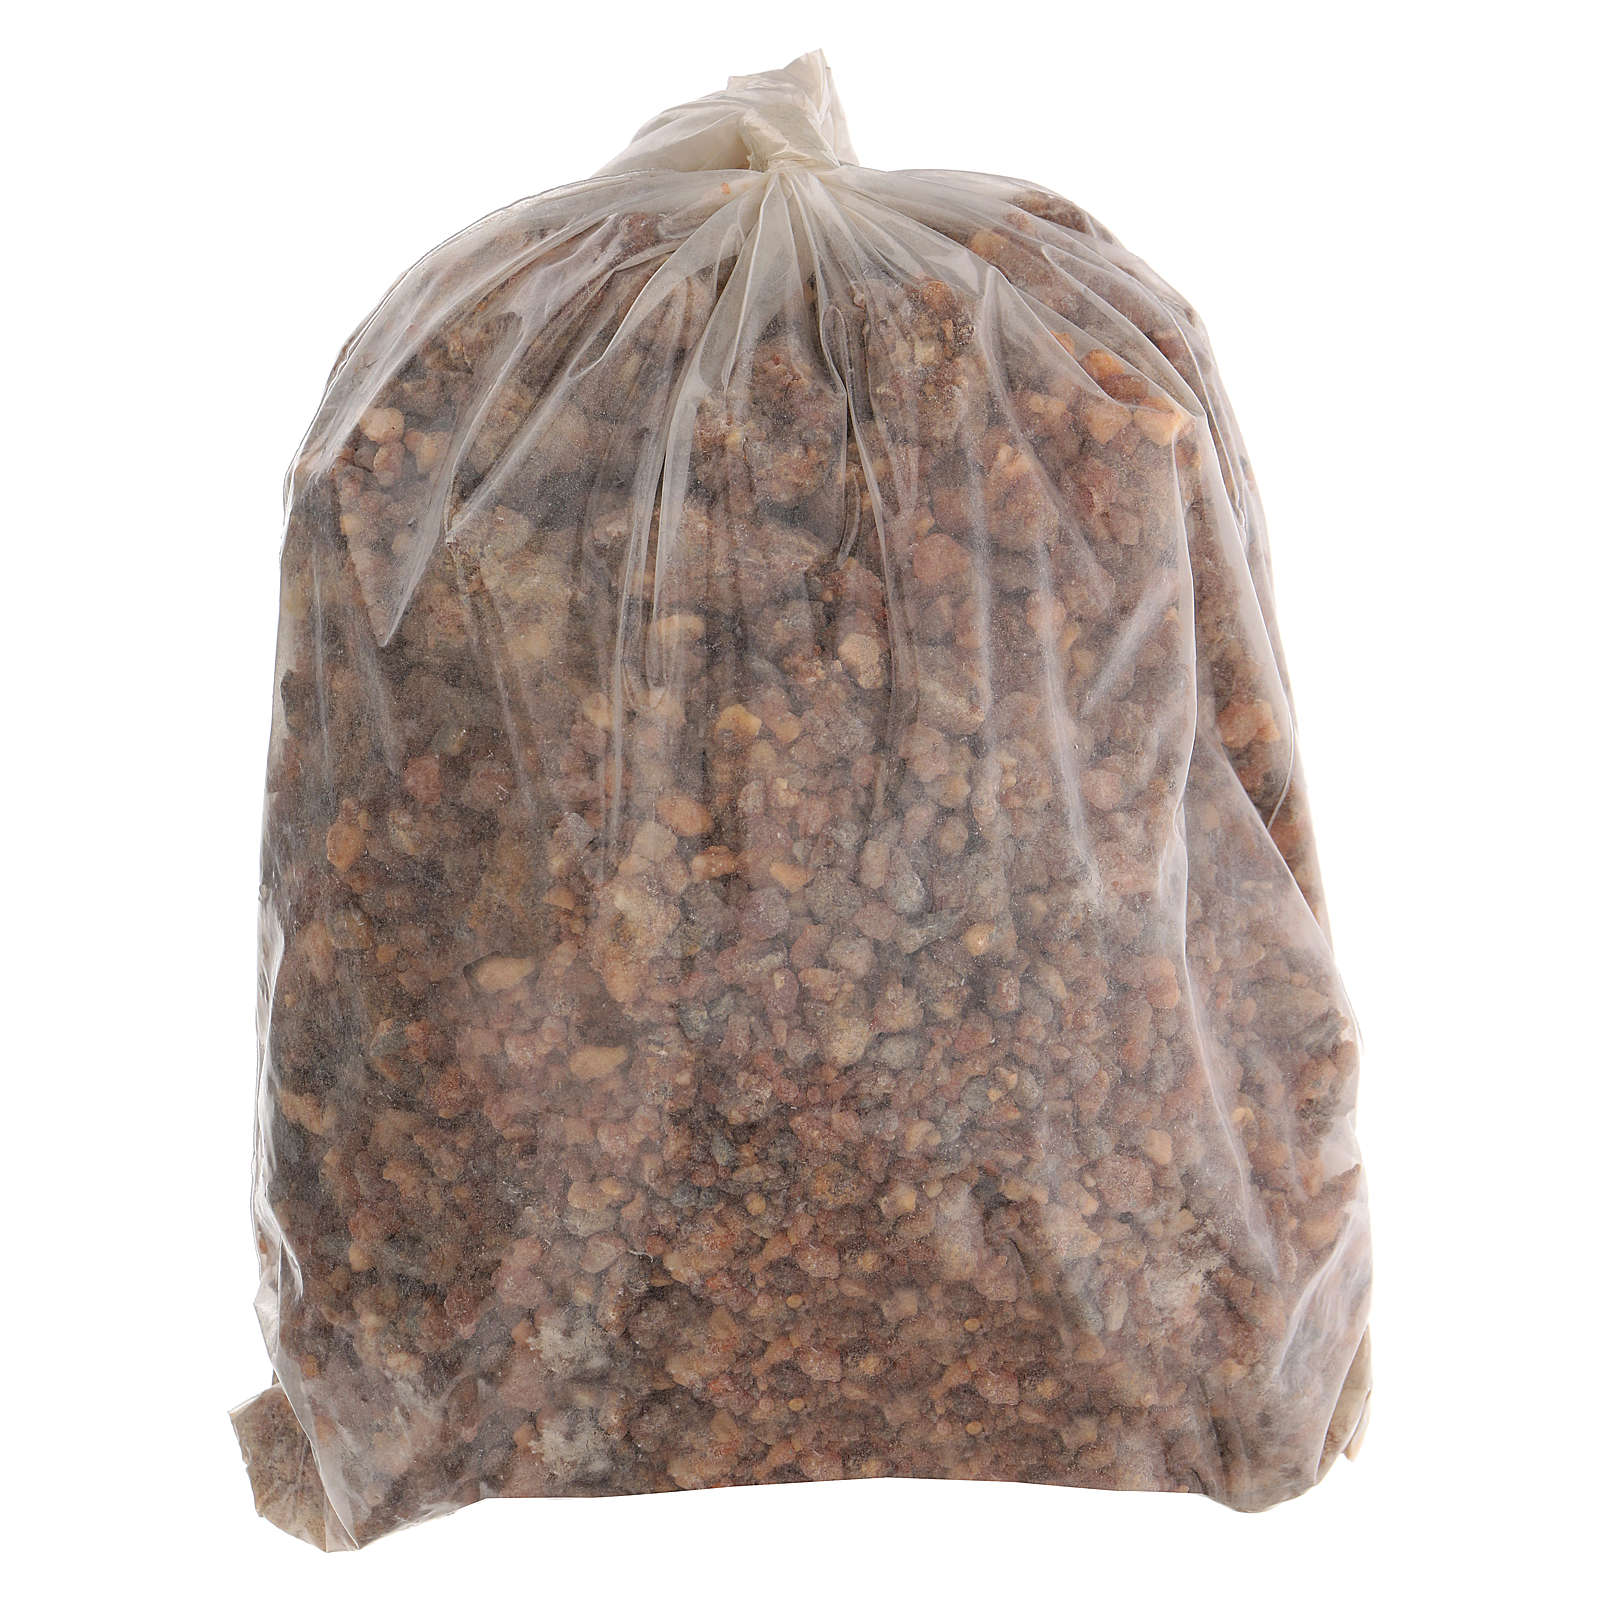 Benzoin Orange incenso 1 kg 3